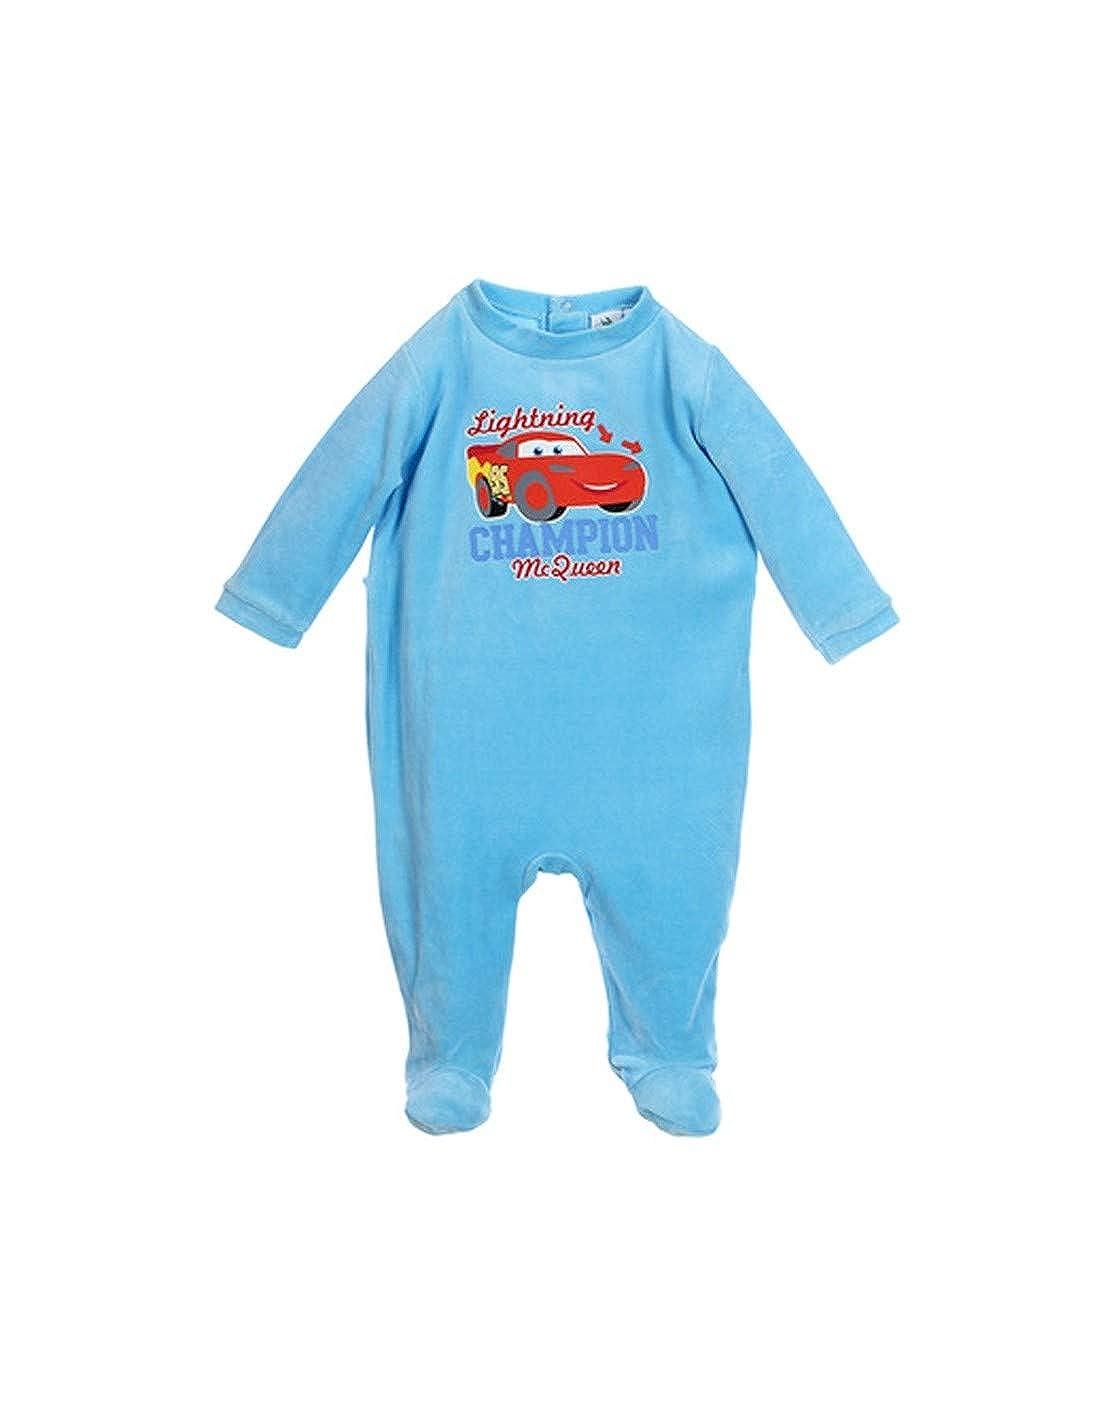 Pyjama Velours bébé garçon Cars Disney Champion Bleu de 3 à 23mois Flash Mc Queen DBV-BG-CAR-OE0340